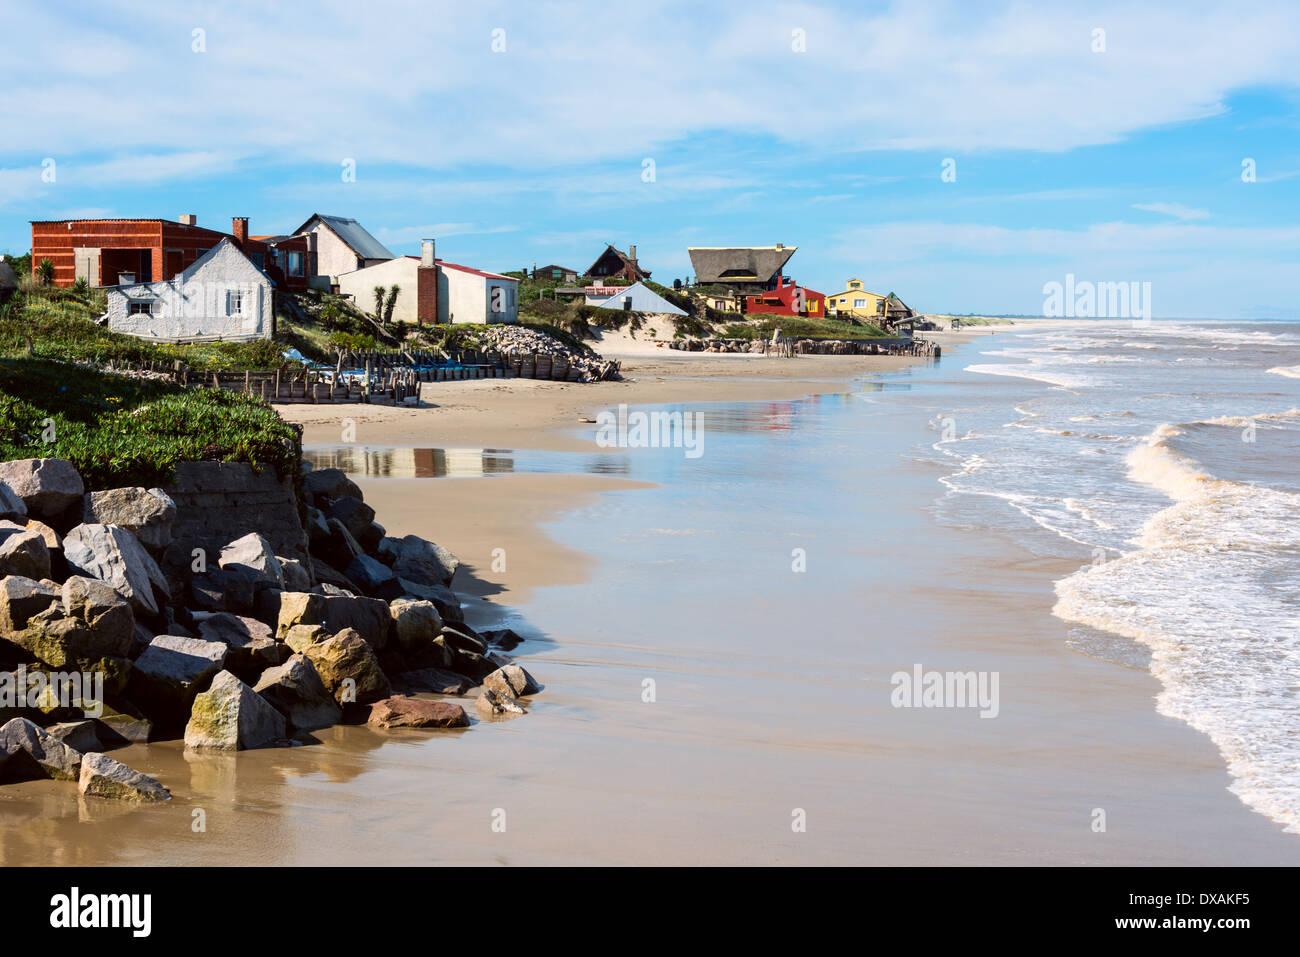 Aguas Dulces Beach in Rocha, Uruguay - Stock Image